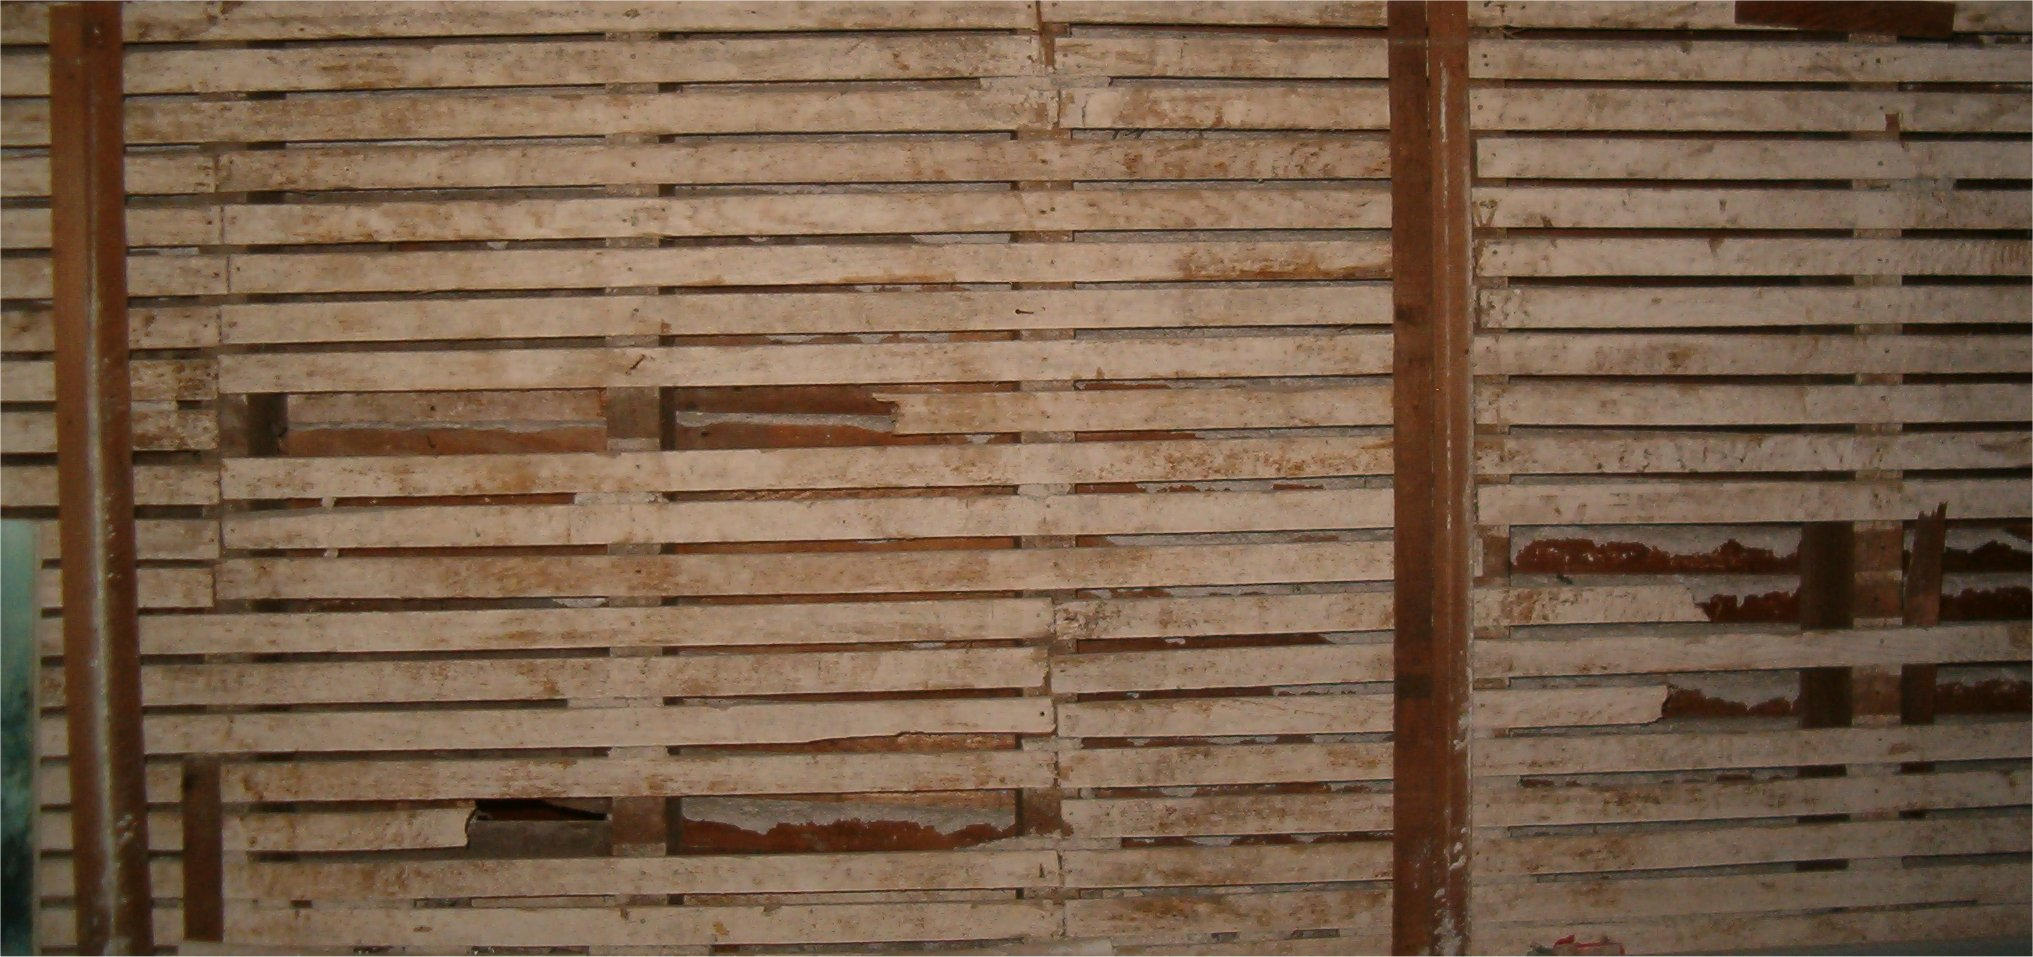 wood slats by falln